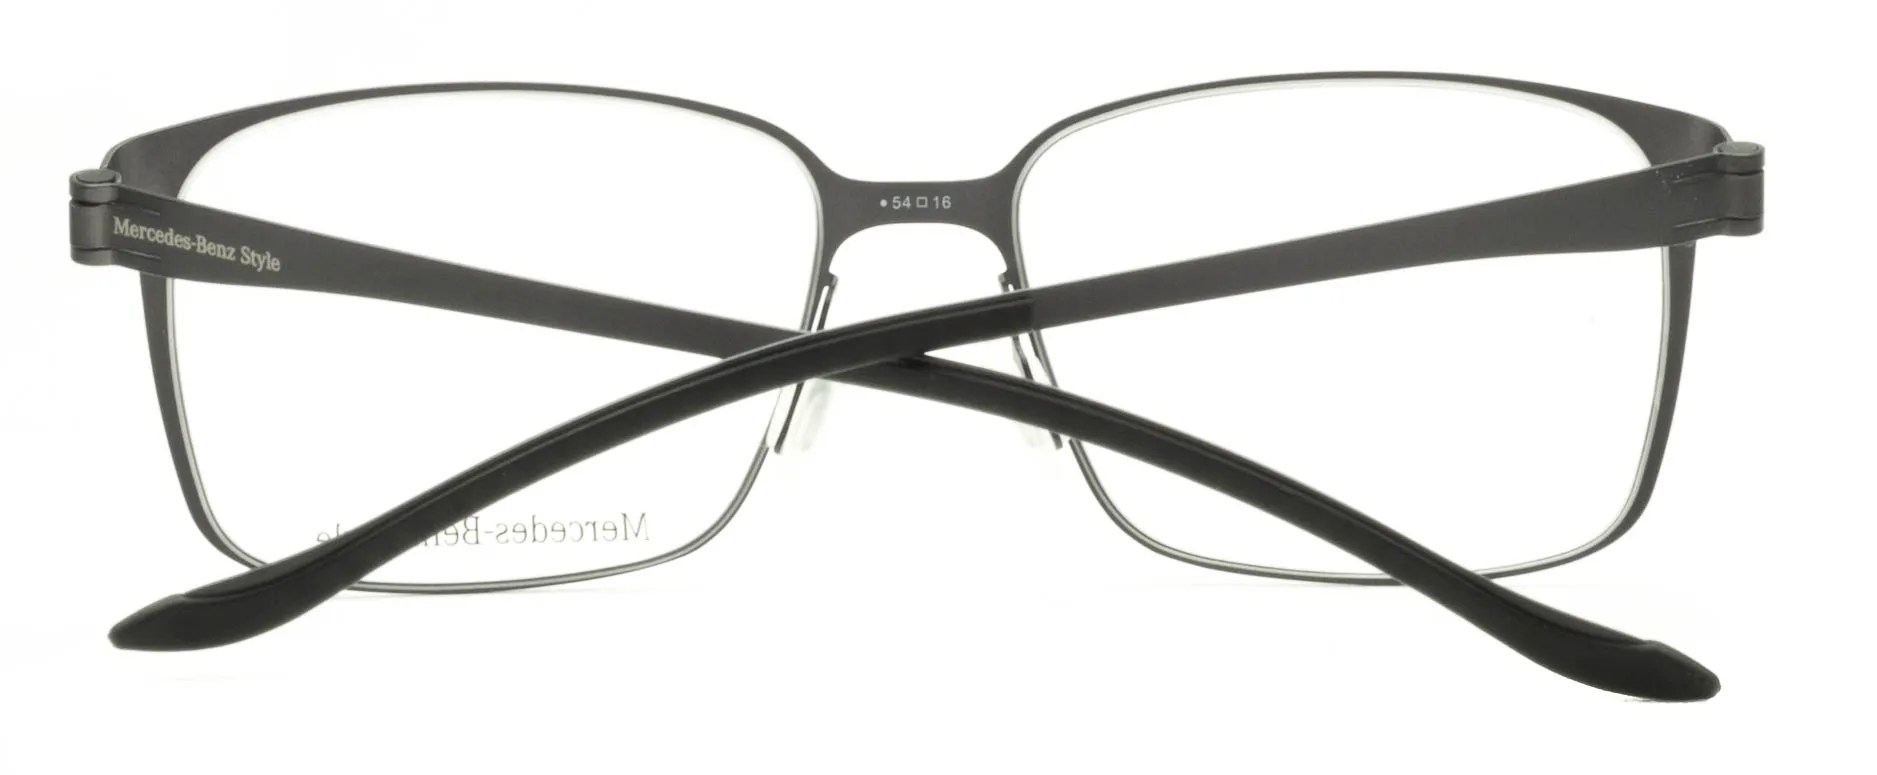 MERCEDES BENZ STYLE M 6037 A 54mm Eyewear FRAMES RX